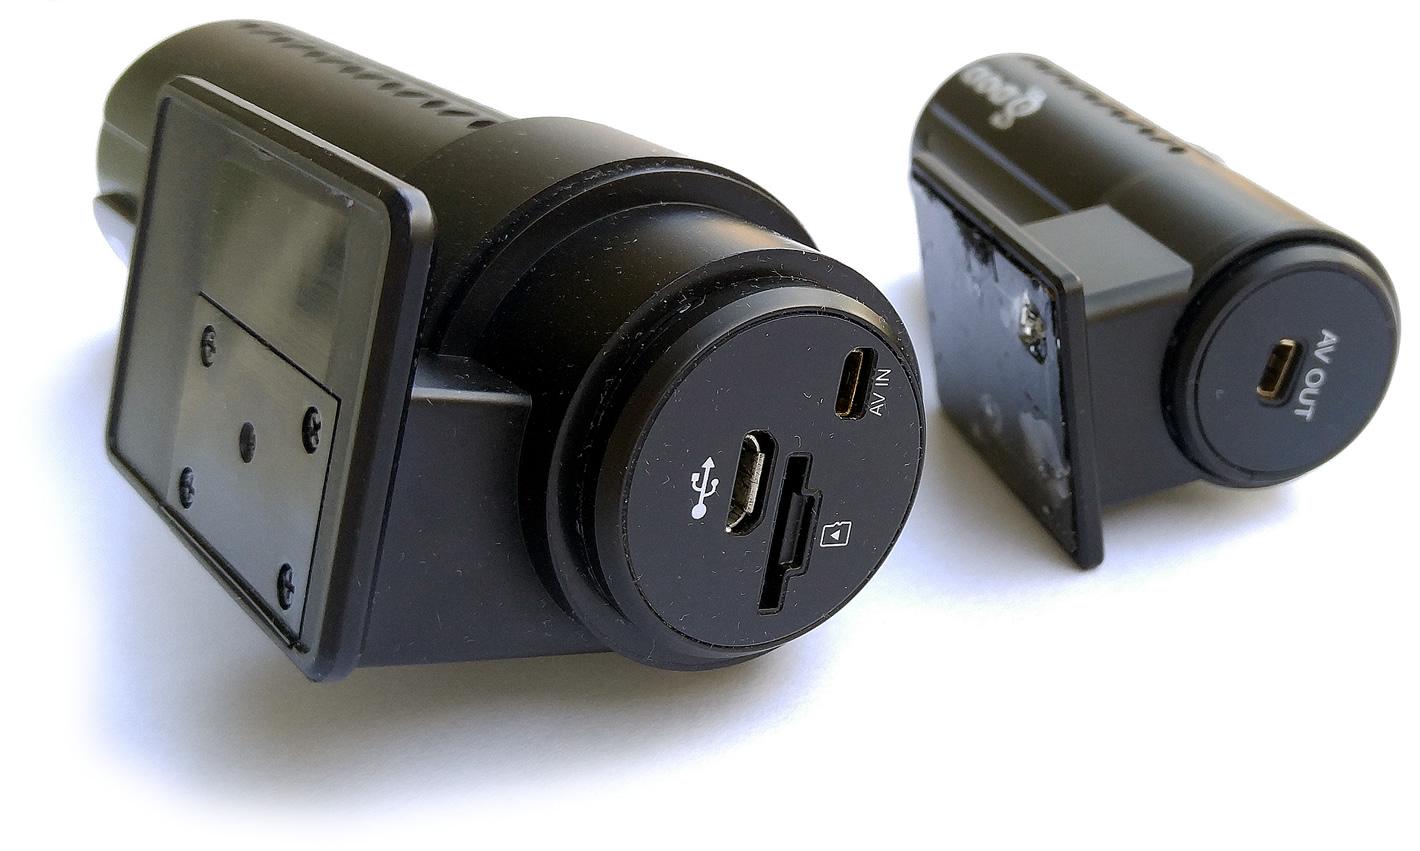 Stopki wideorejestratora DOD RC500S